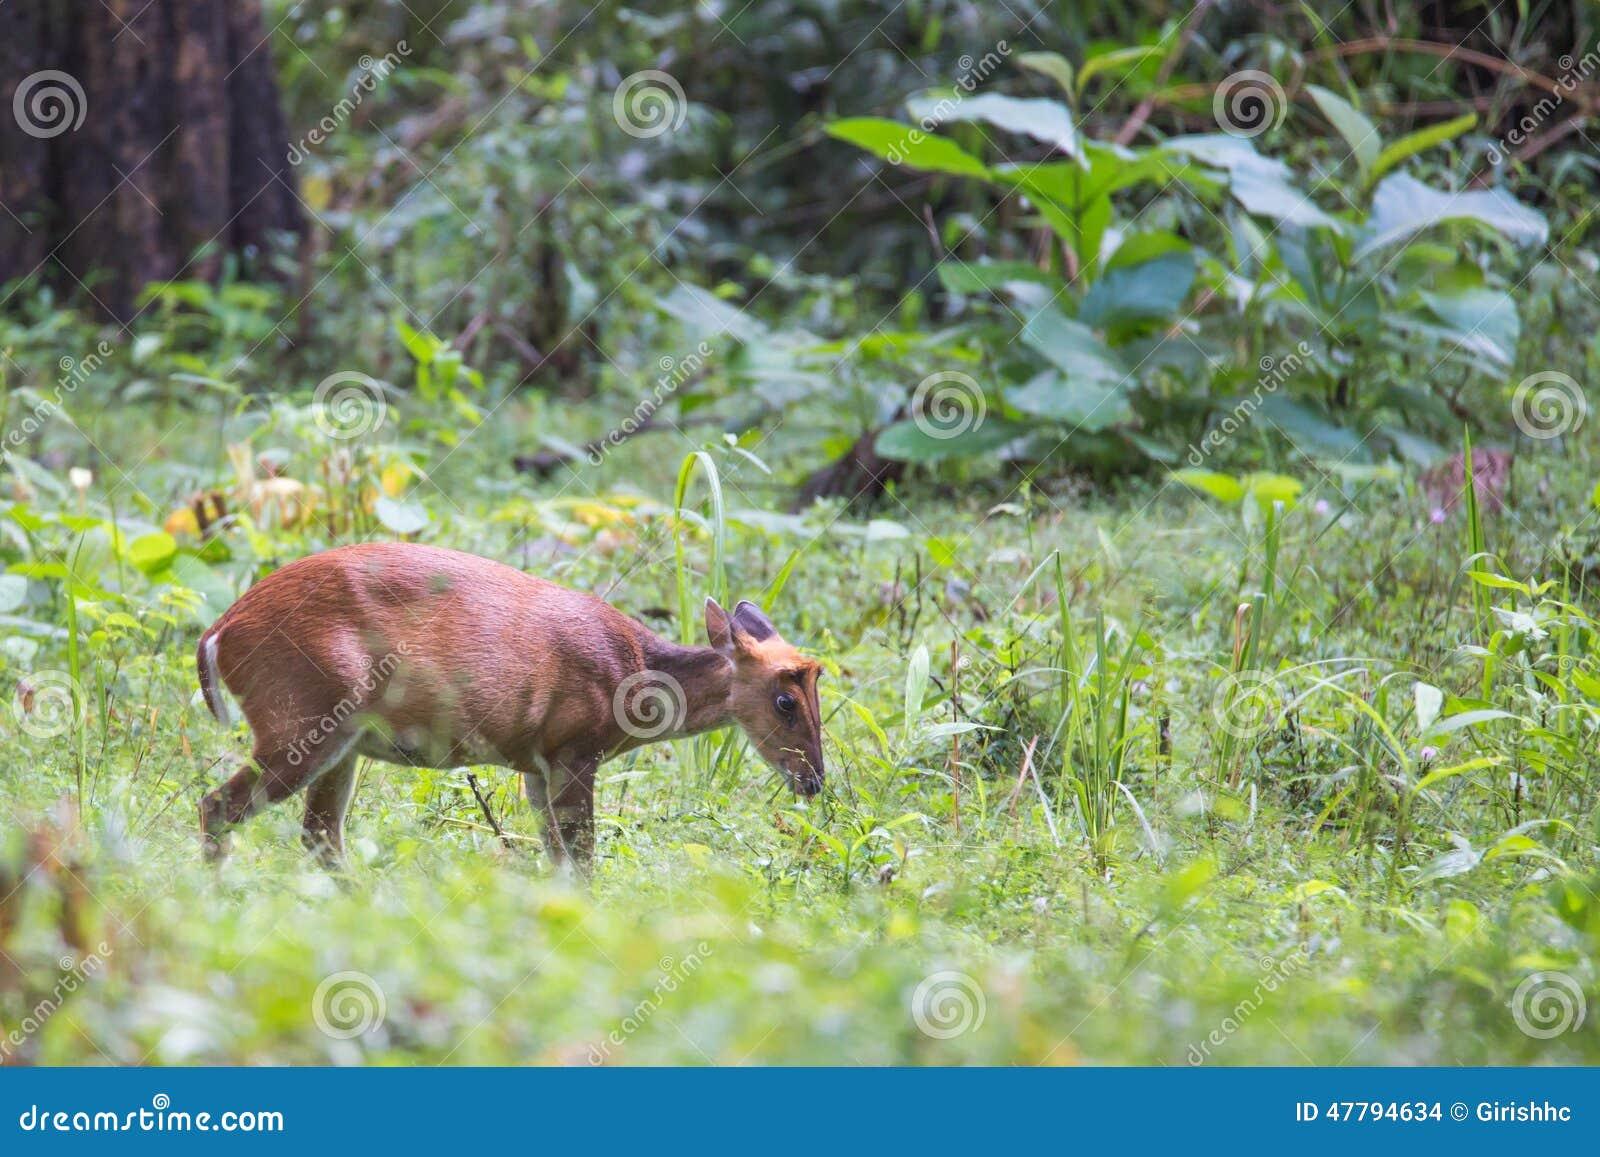 Barking Deer Closeupwith Habitat Stock Photo Image Of Enjoyment